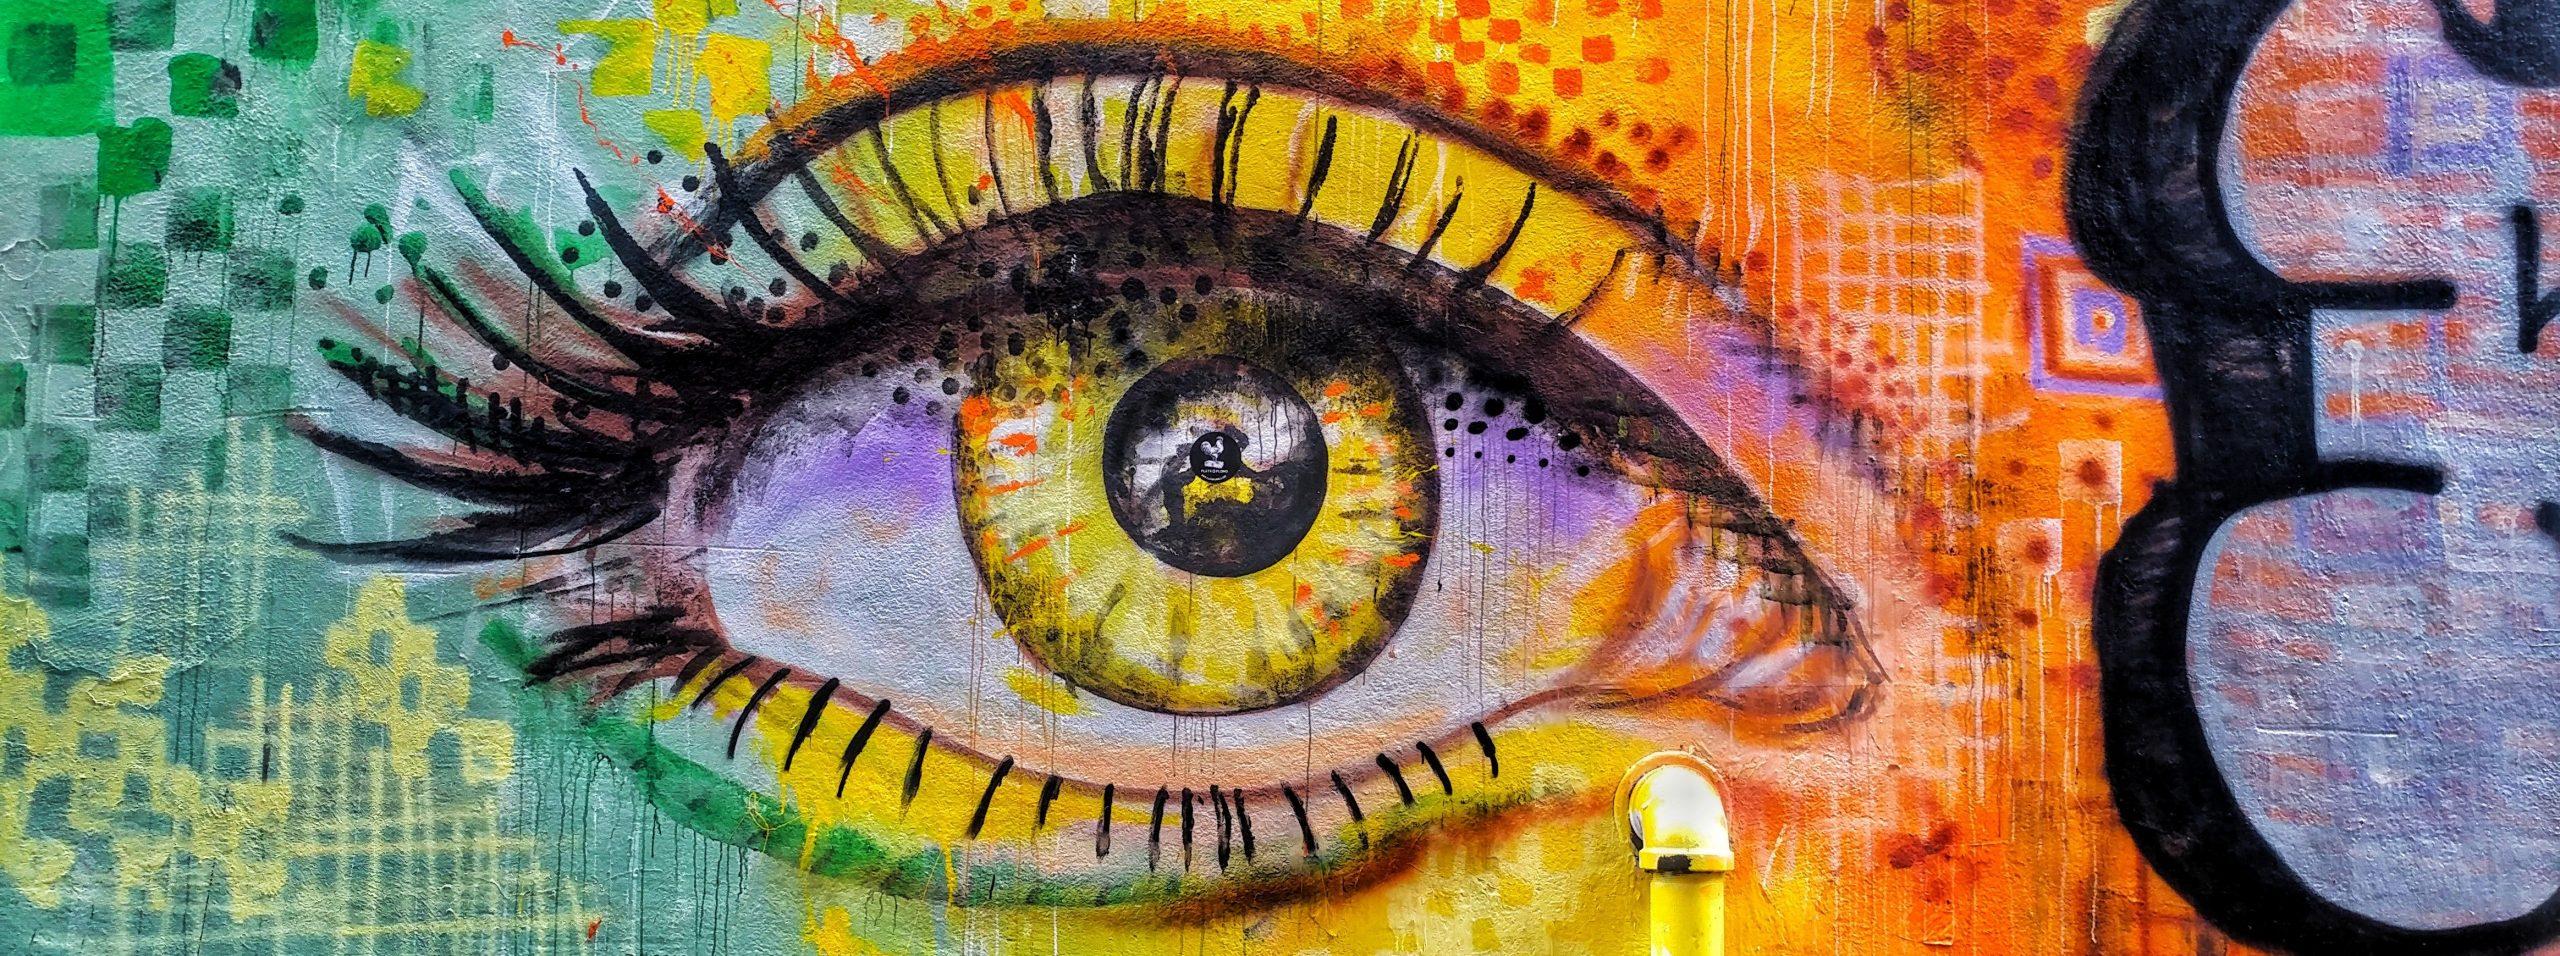 Street art occhio eye arte